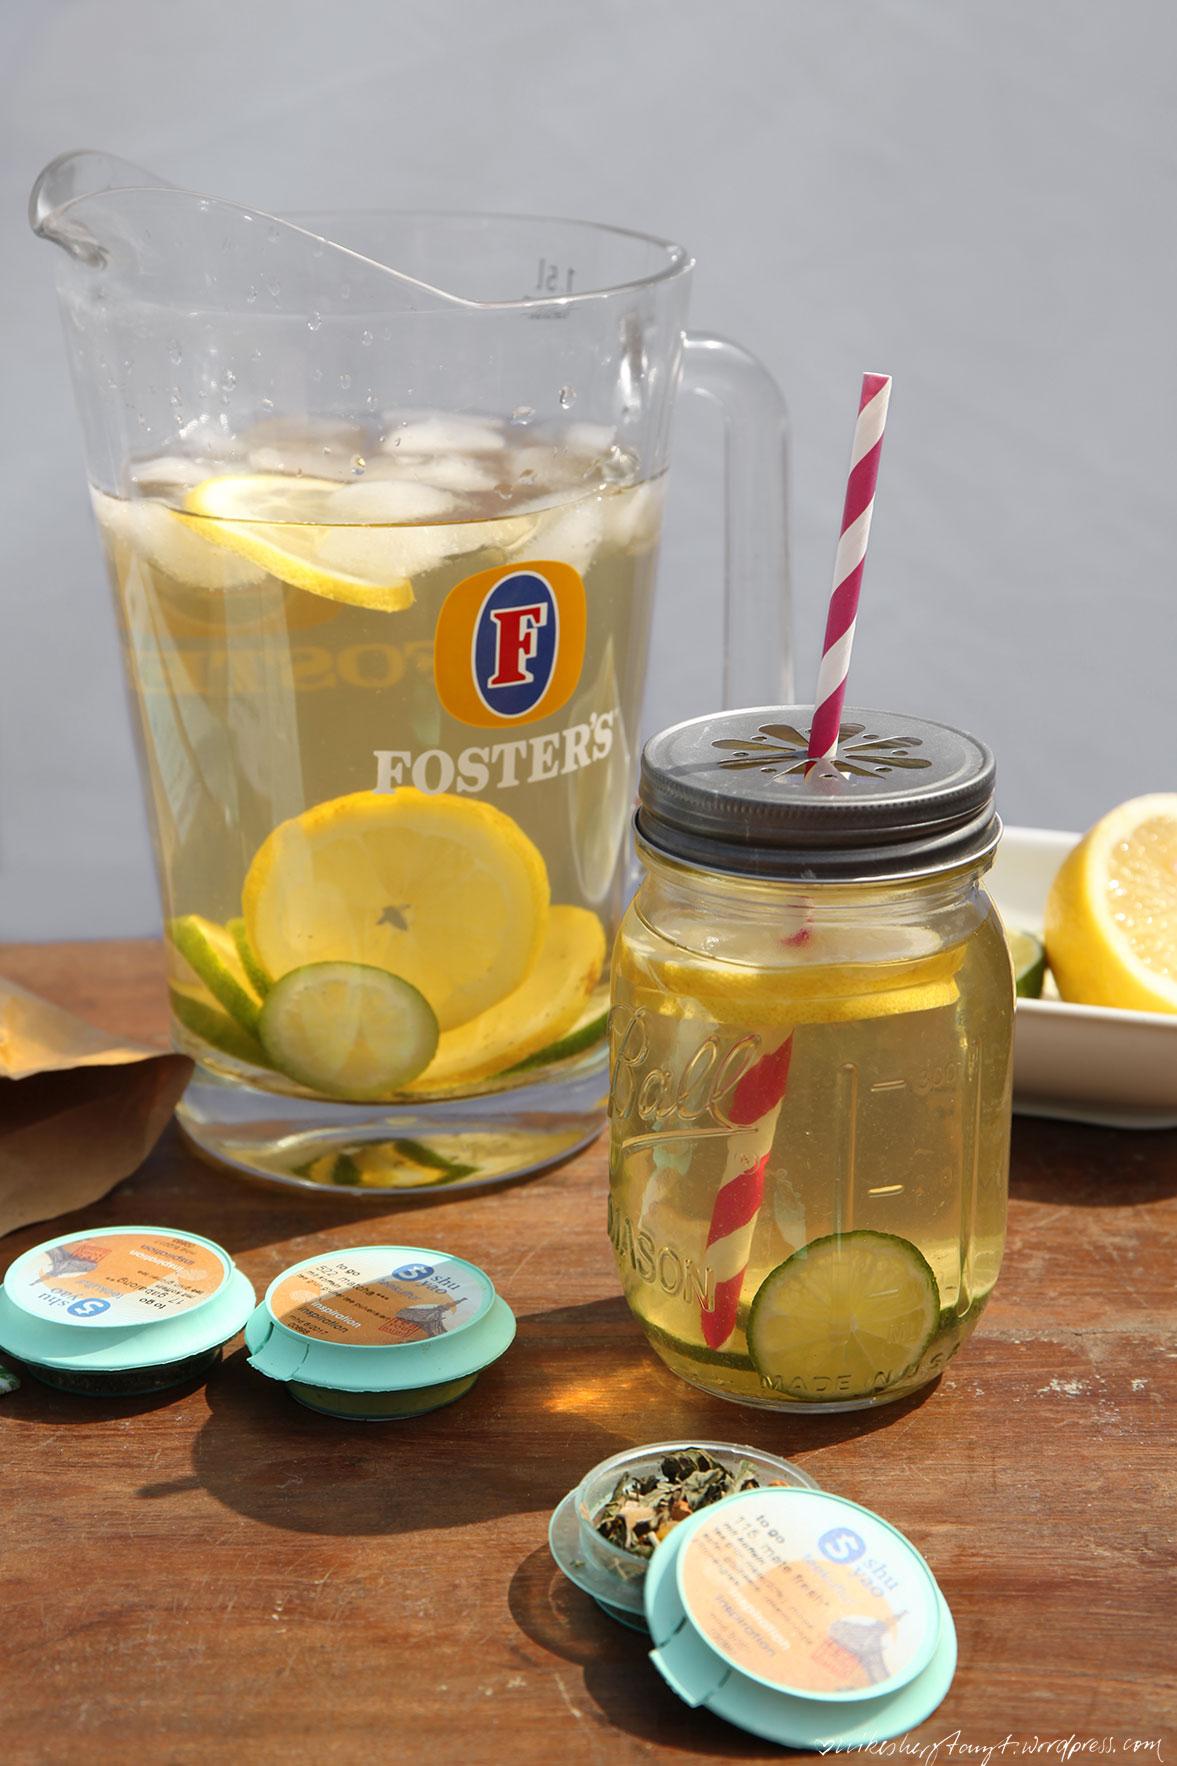 shuyoa, mate fresh, detox, lemon, lime, eistee, icetea, fosters beer pitcher, nikesherztanzt